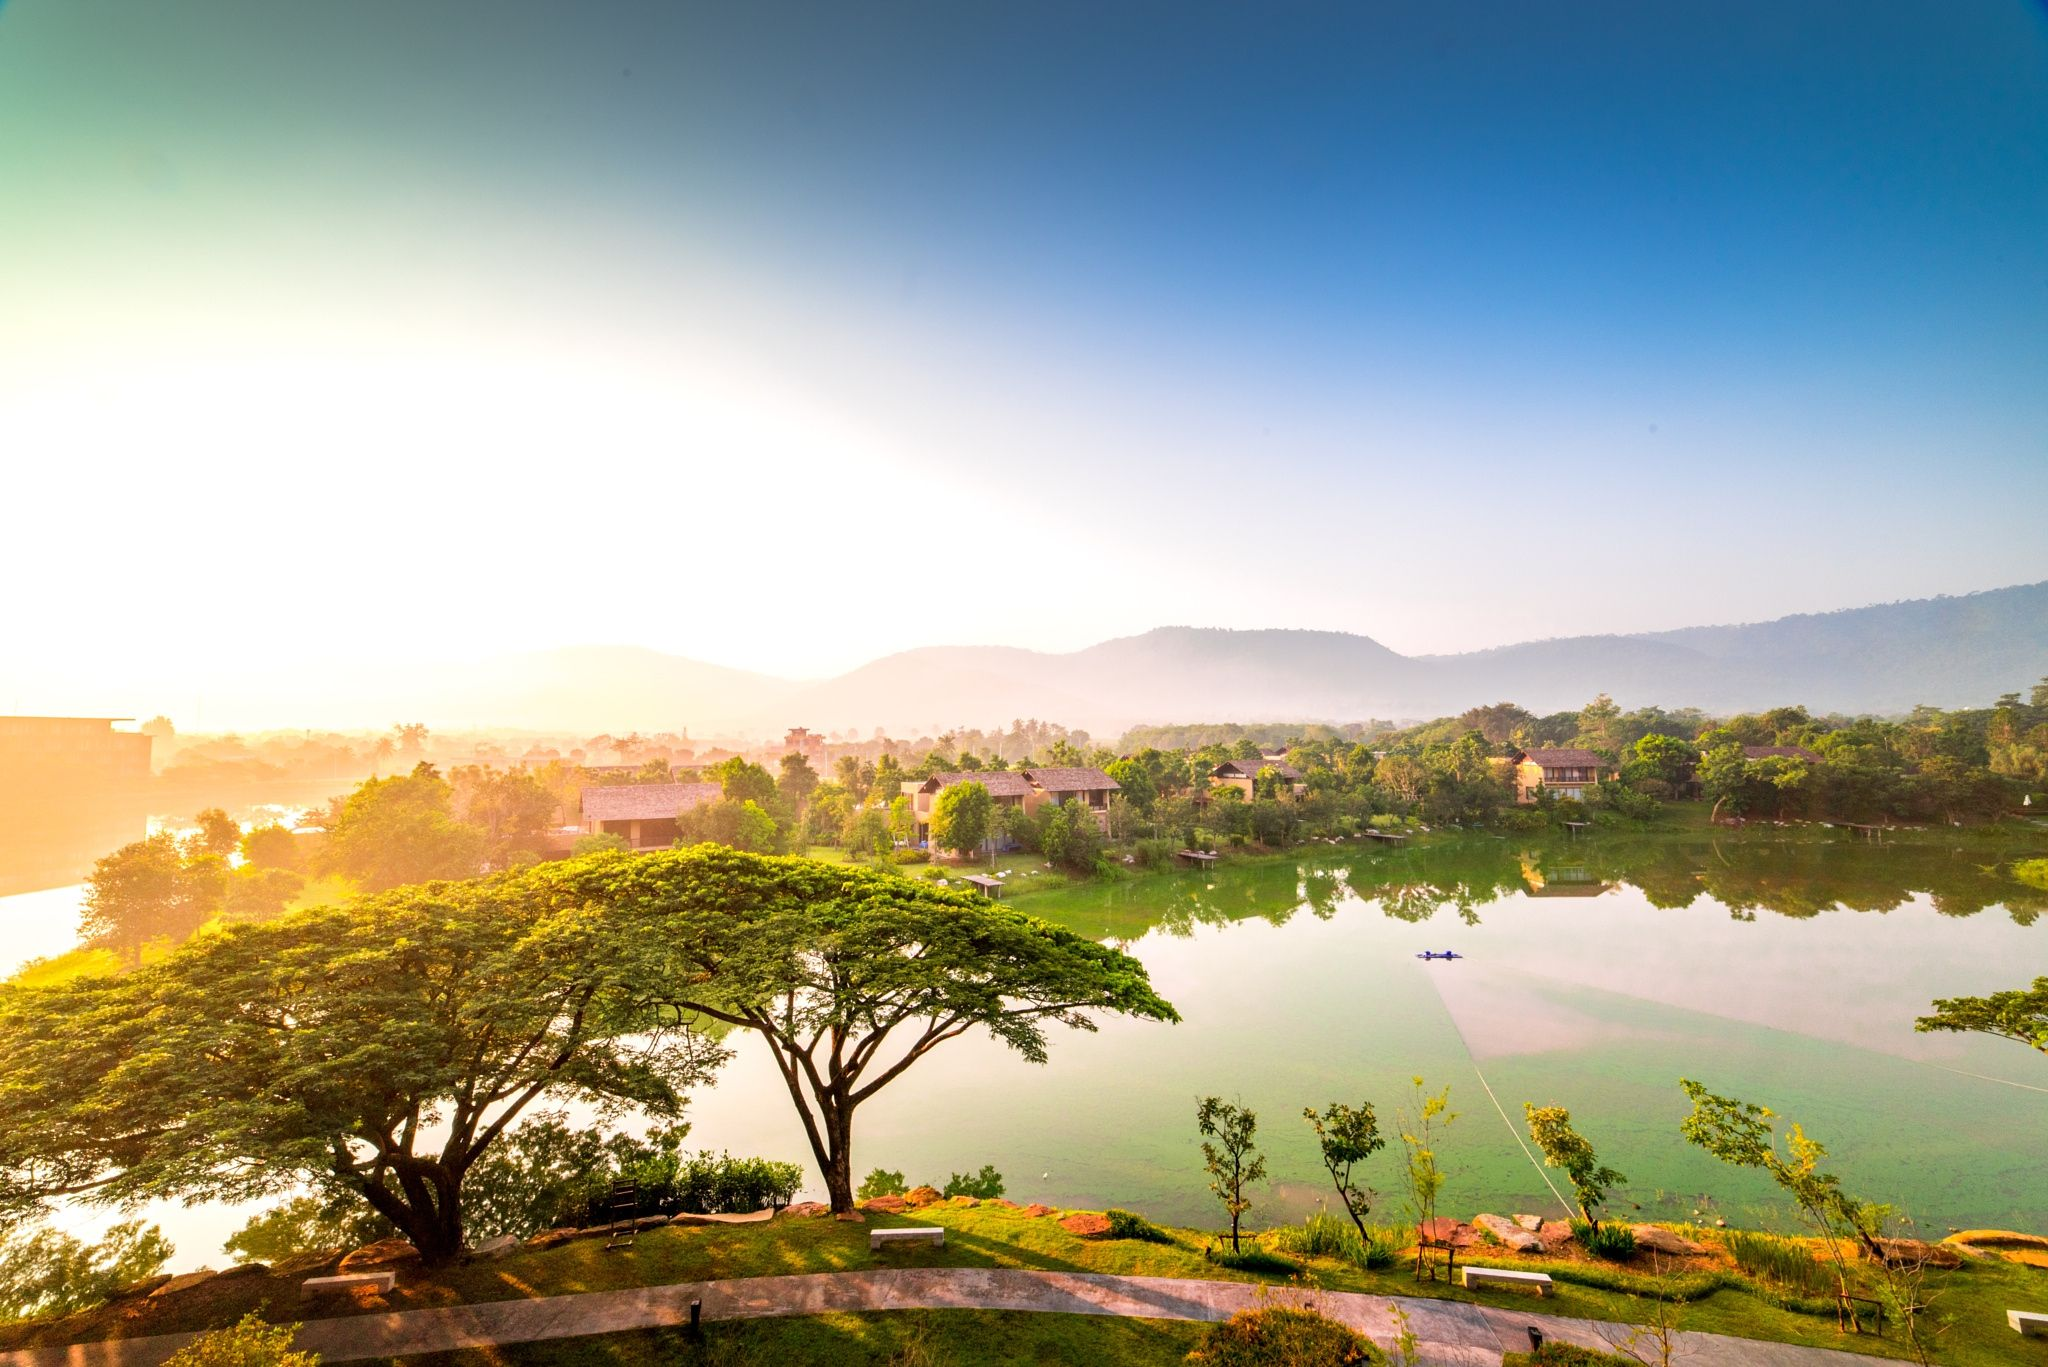 VK - View from Atta Resort in Nakorn Rachasima, Thailand.